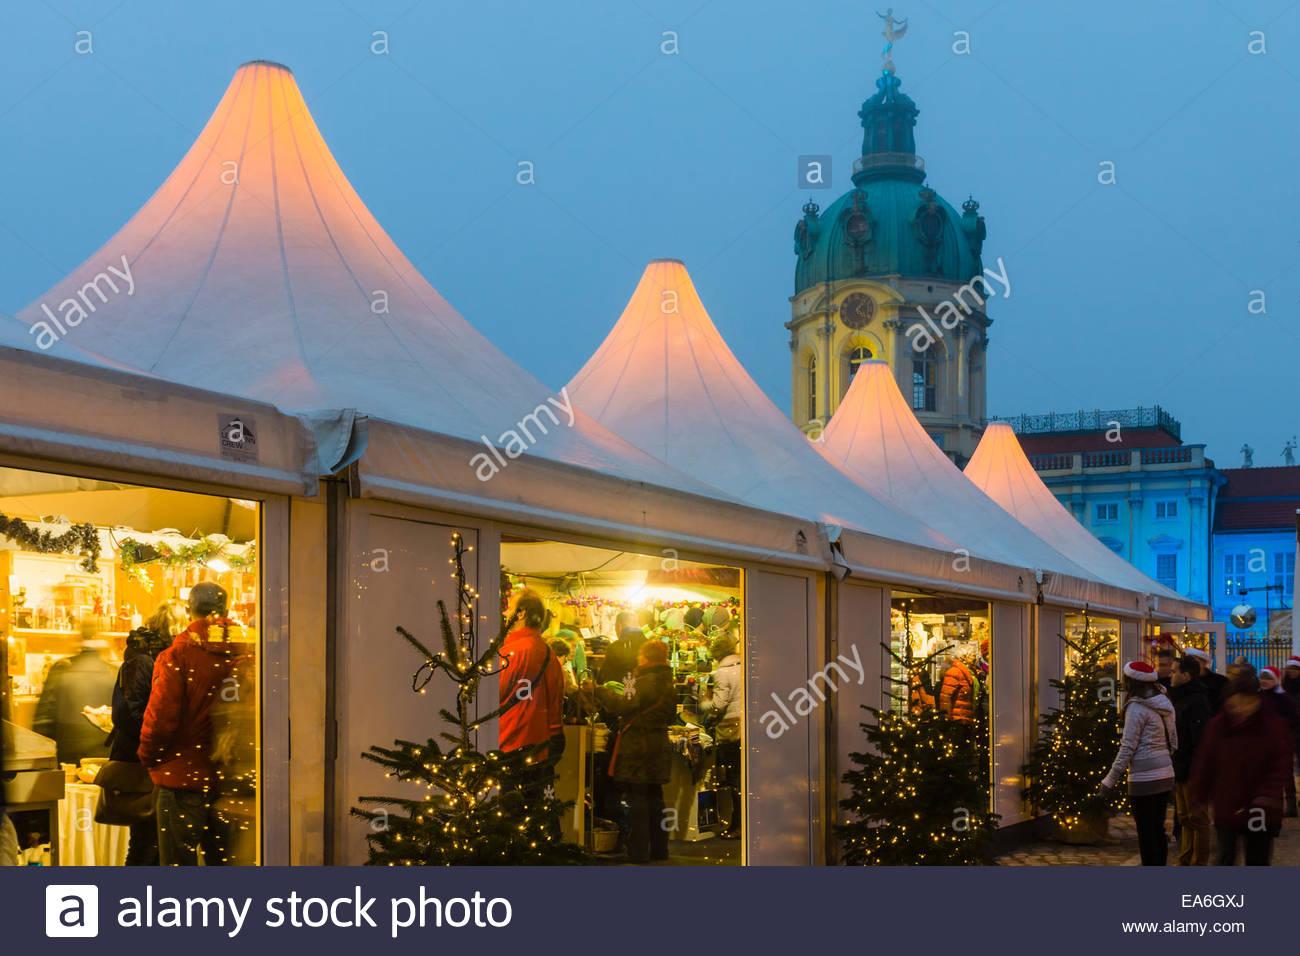 Germany, Berlin, Christmas market at Charlottenburg Palace Stock Photo